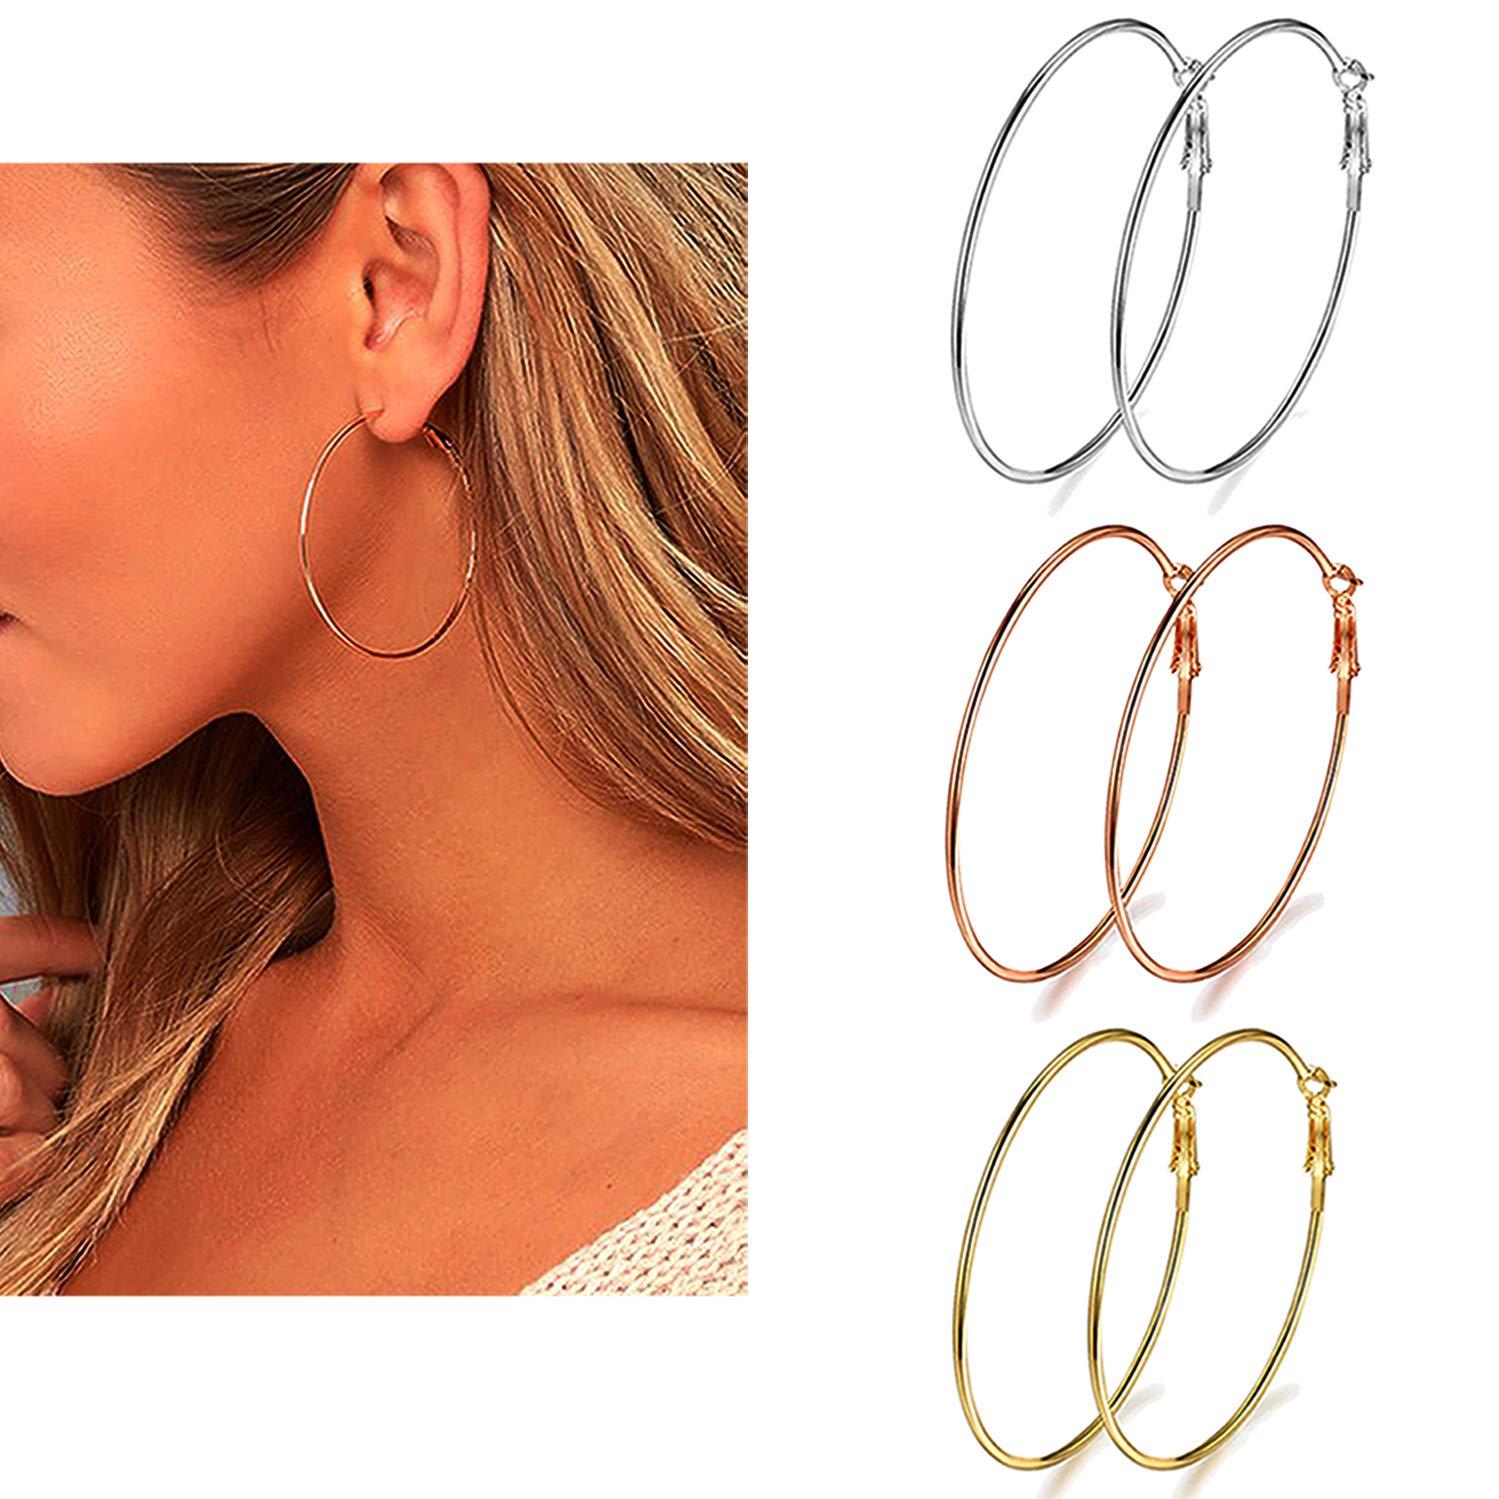 2e6bb9b6c455b 3 Pairs Big Hoop Earrings, Stainless Steel Hoop Earrings in Gold Plated  Rose Gold Plated Silver for Women Girls